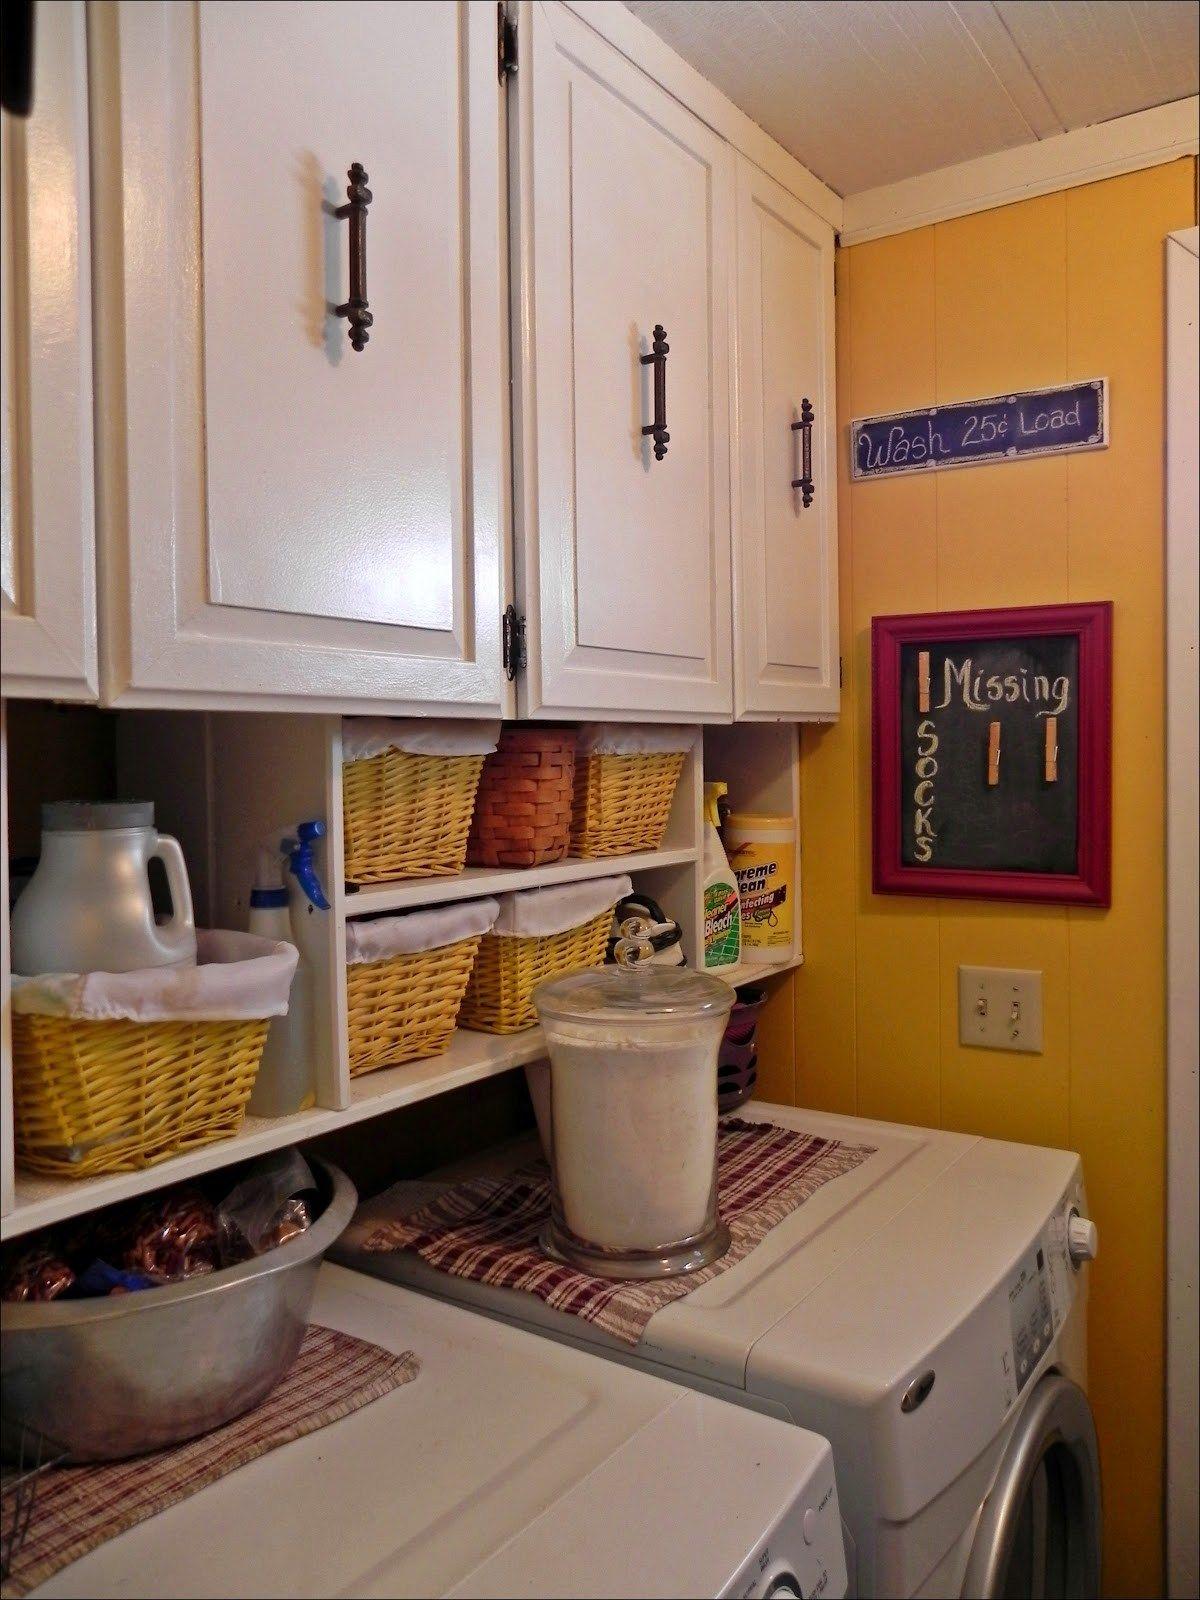 room ideas pinterest storage minimalist laundry cheap decorating lowes